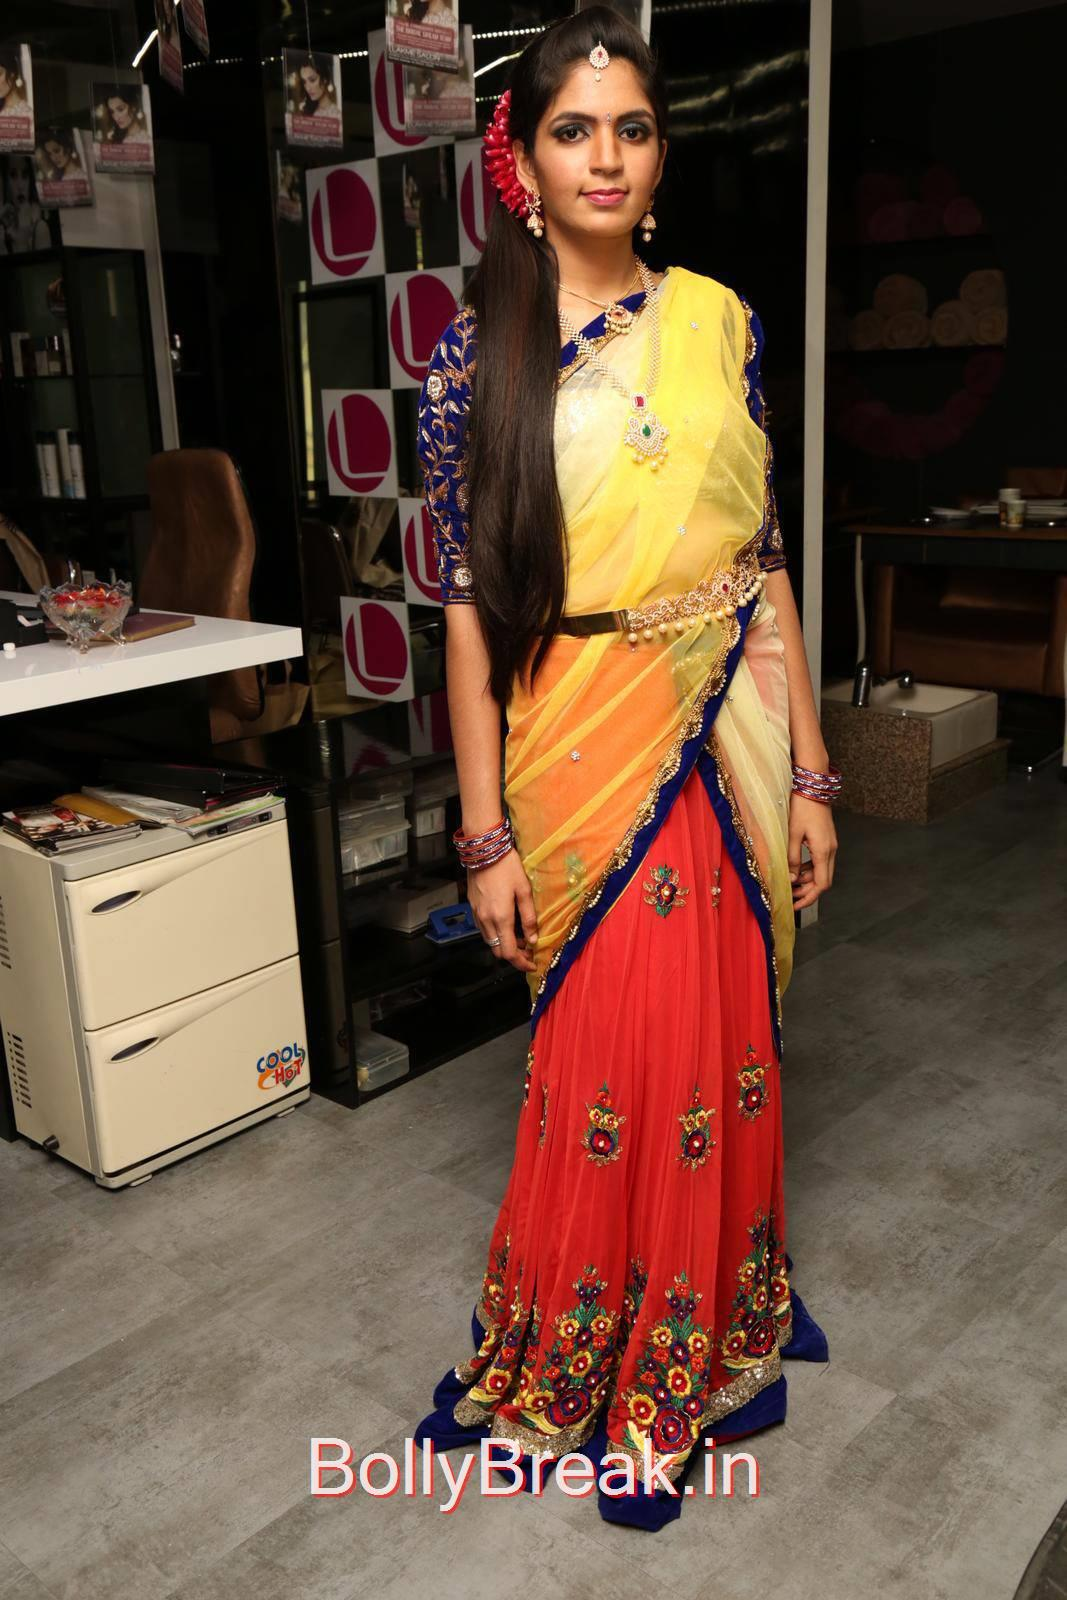 Anusha Unseen Stills, Anusha Hot Pics from Bridal Dream Make up At Lakme Salon